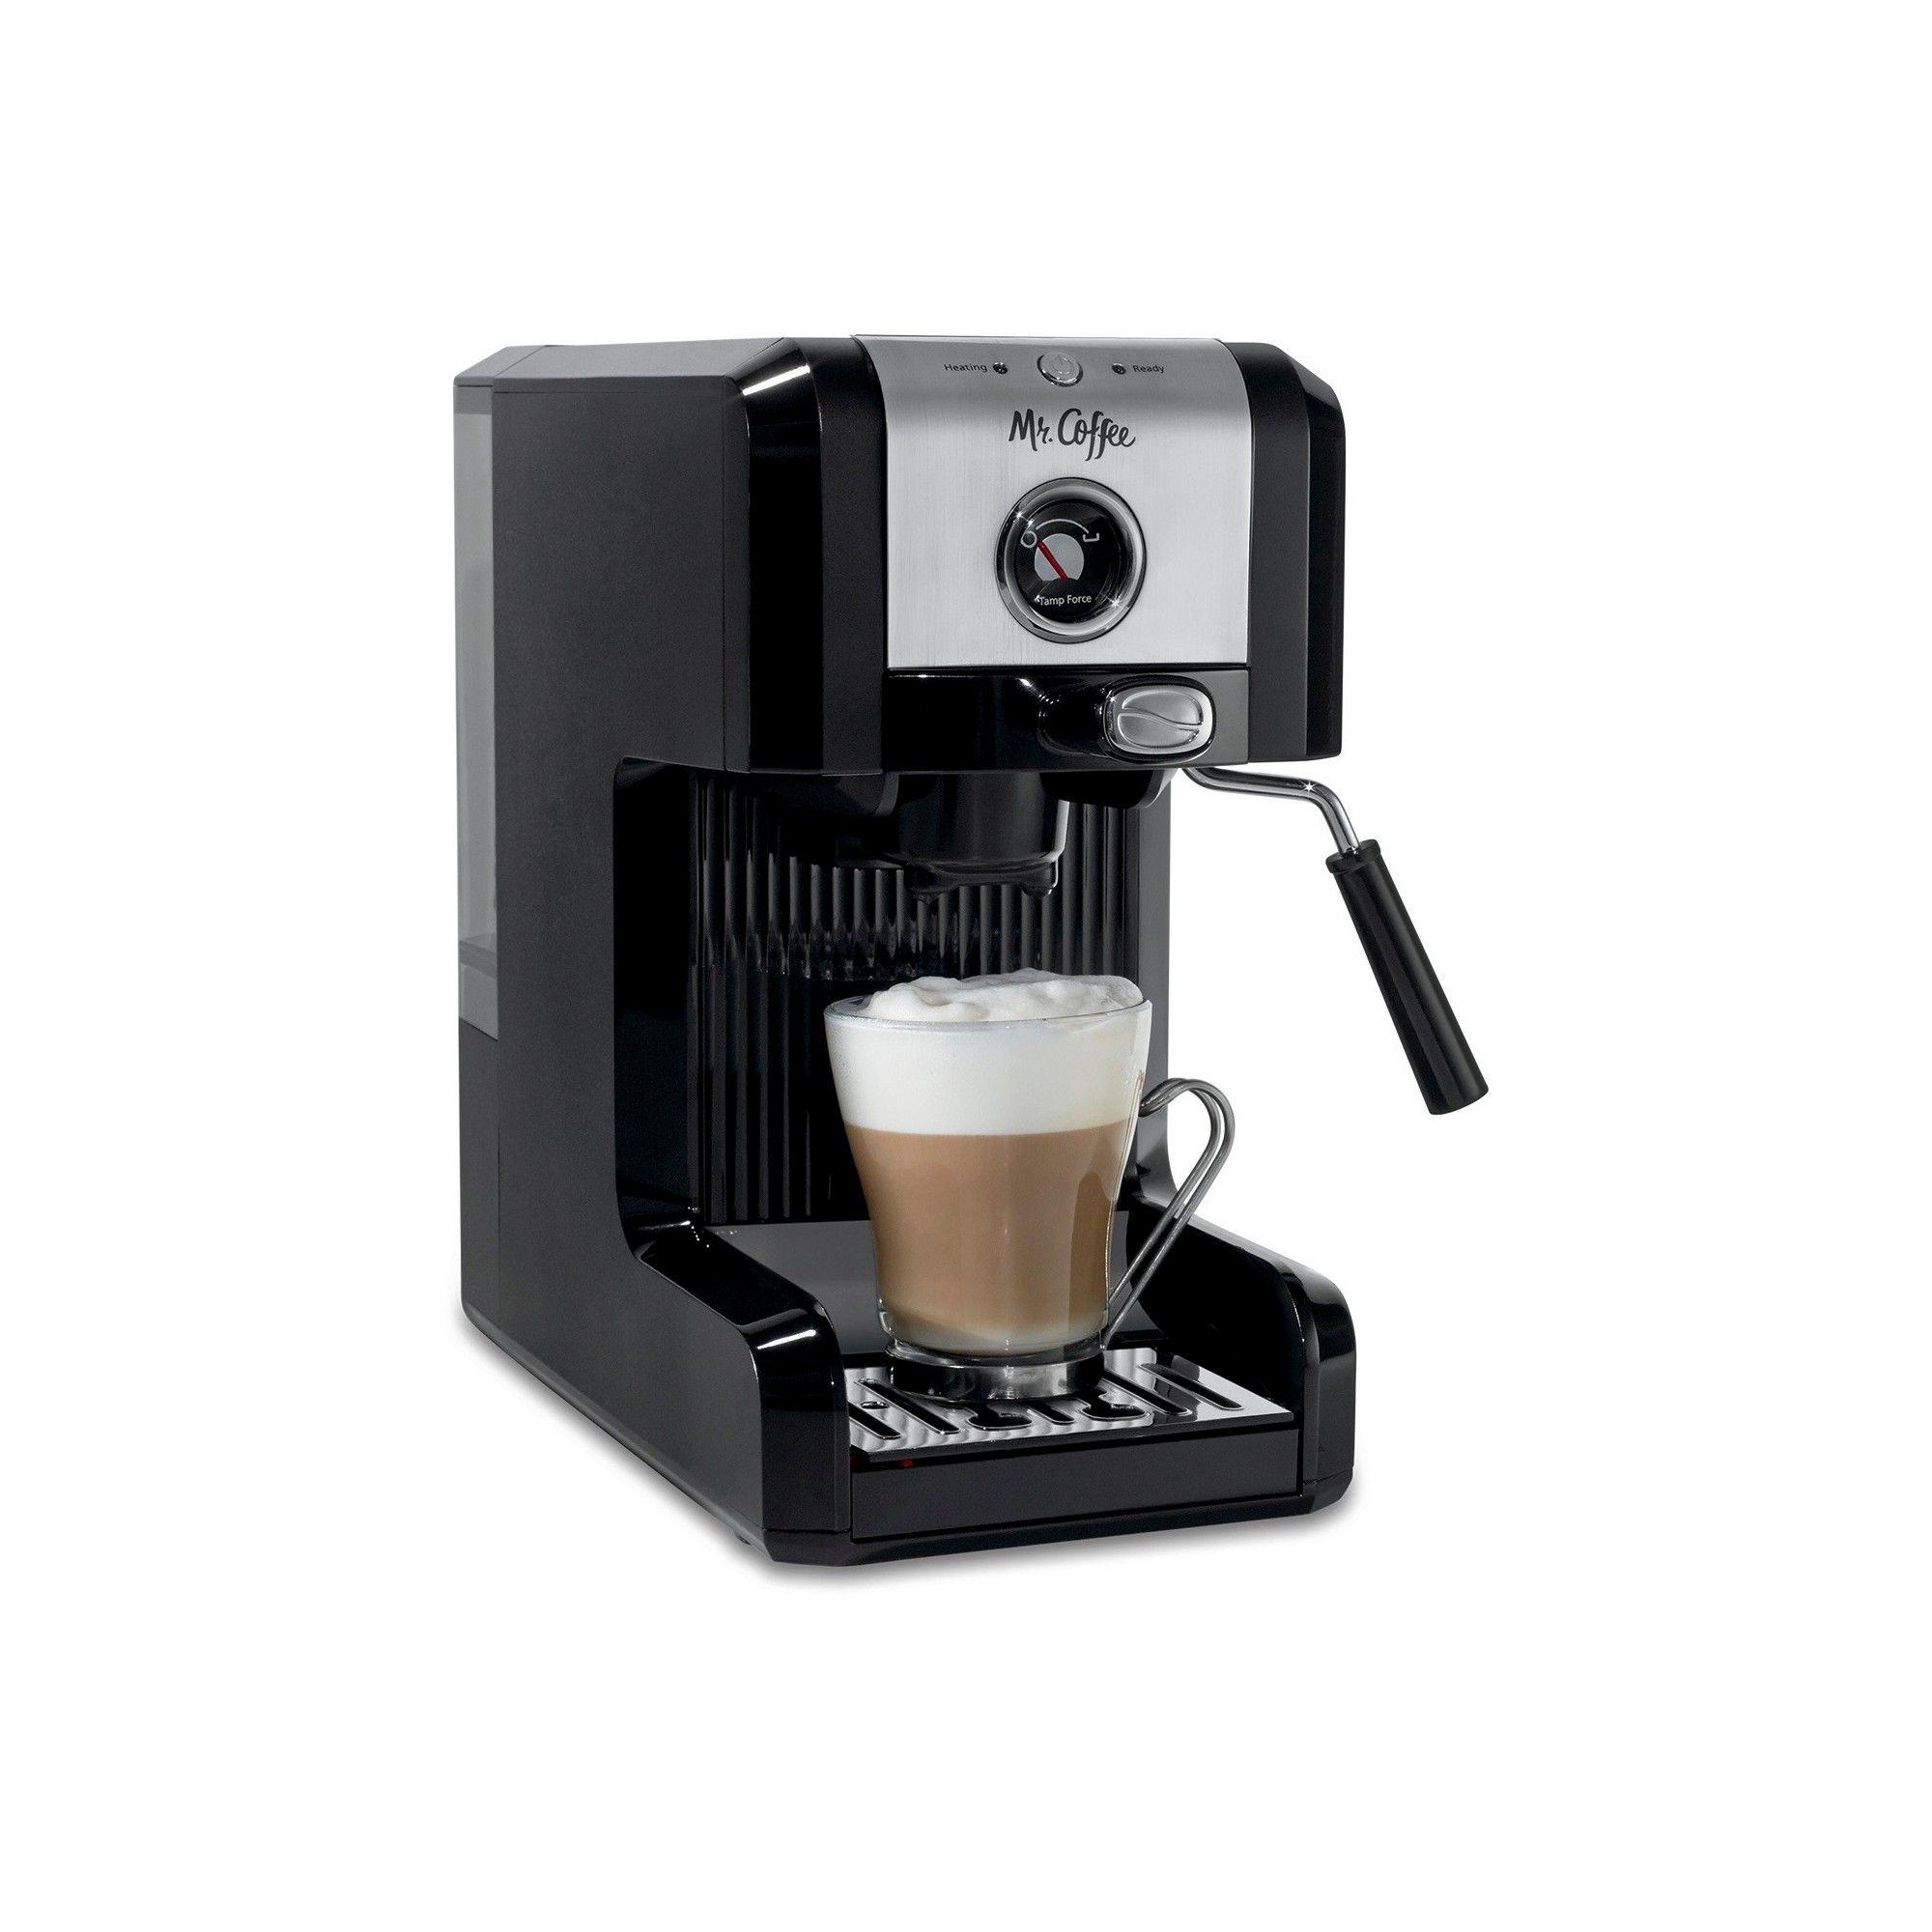 Mr. Coffee Simply Espresso - Black BVMC-ECMPT1000 #espressoathome